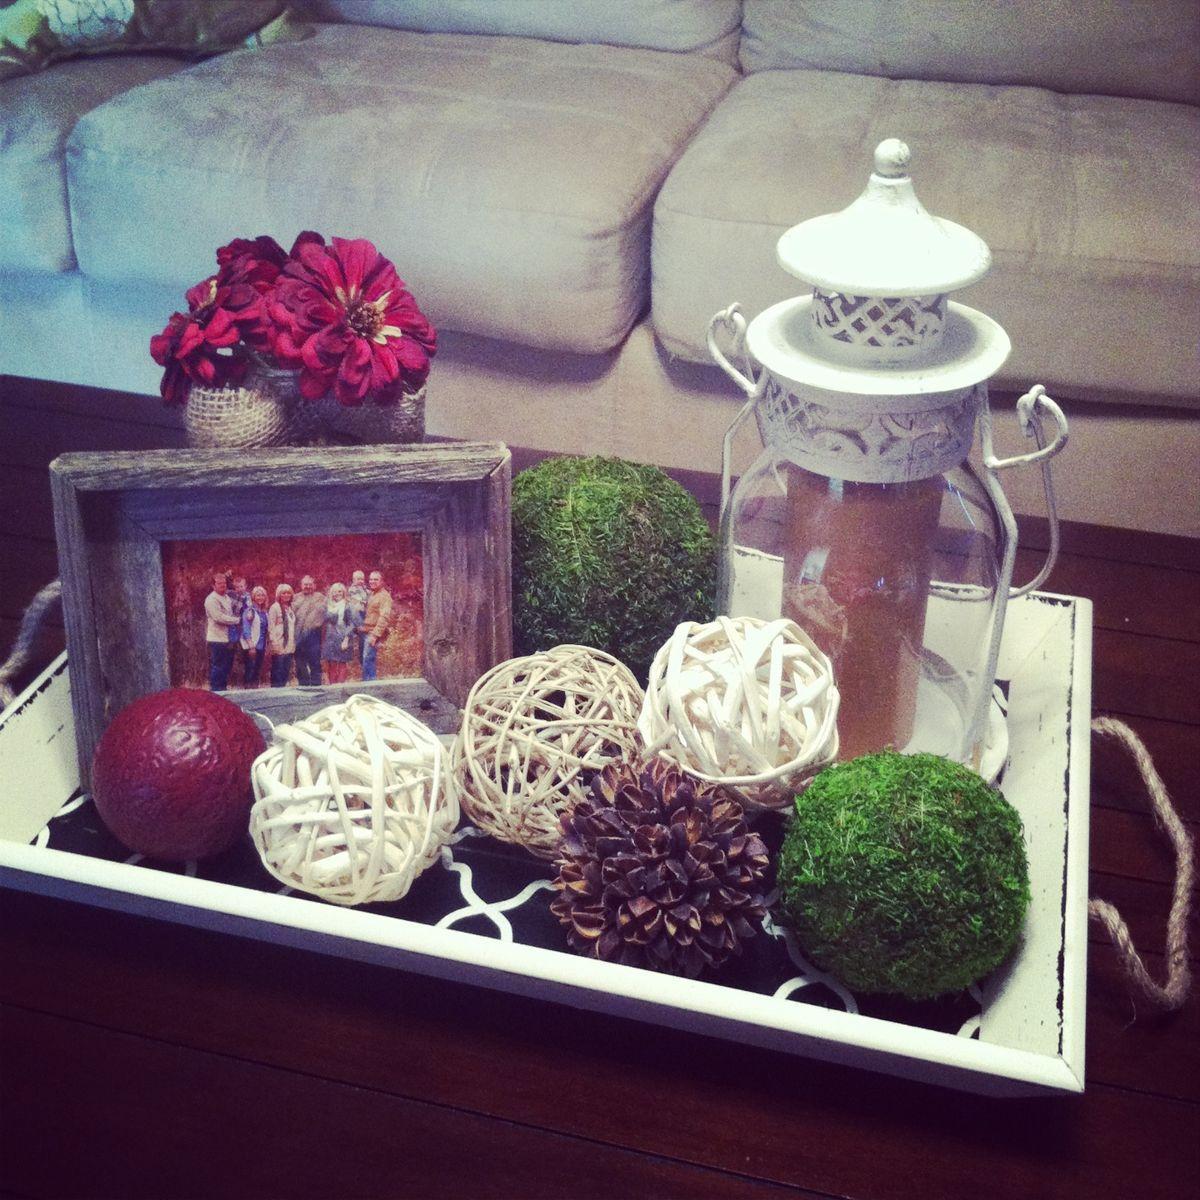 Pin by Rhonda Gombaski on DIY home ideas | Decorating ...